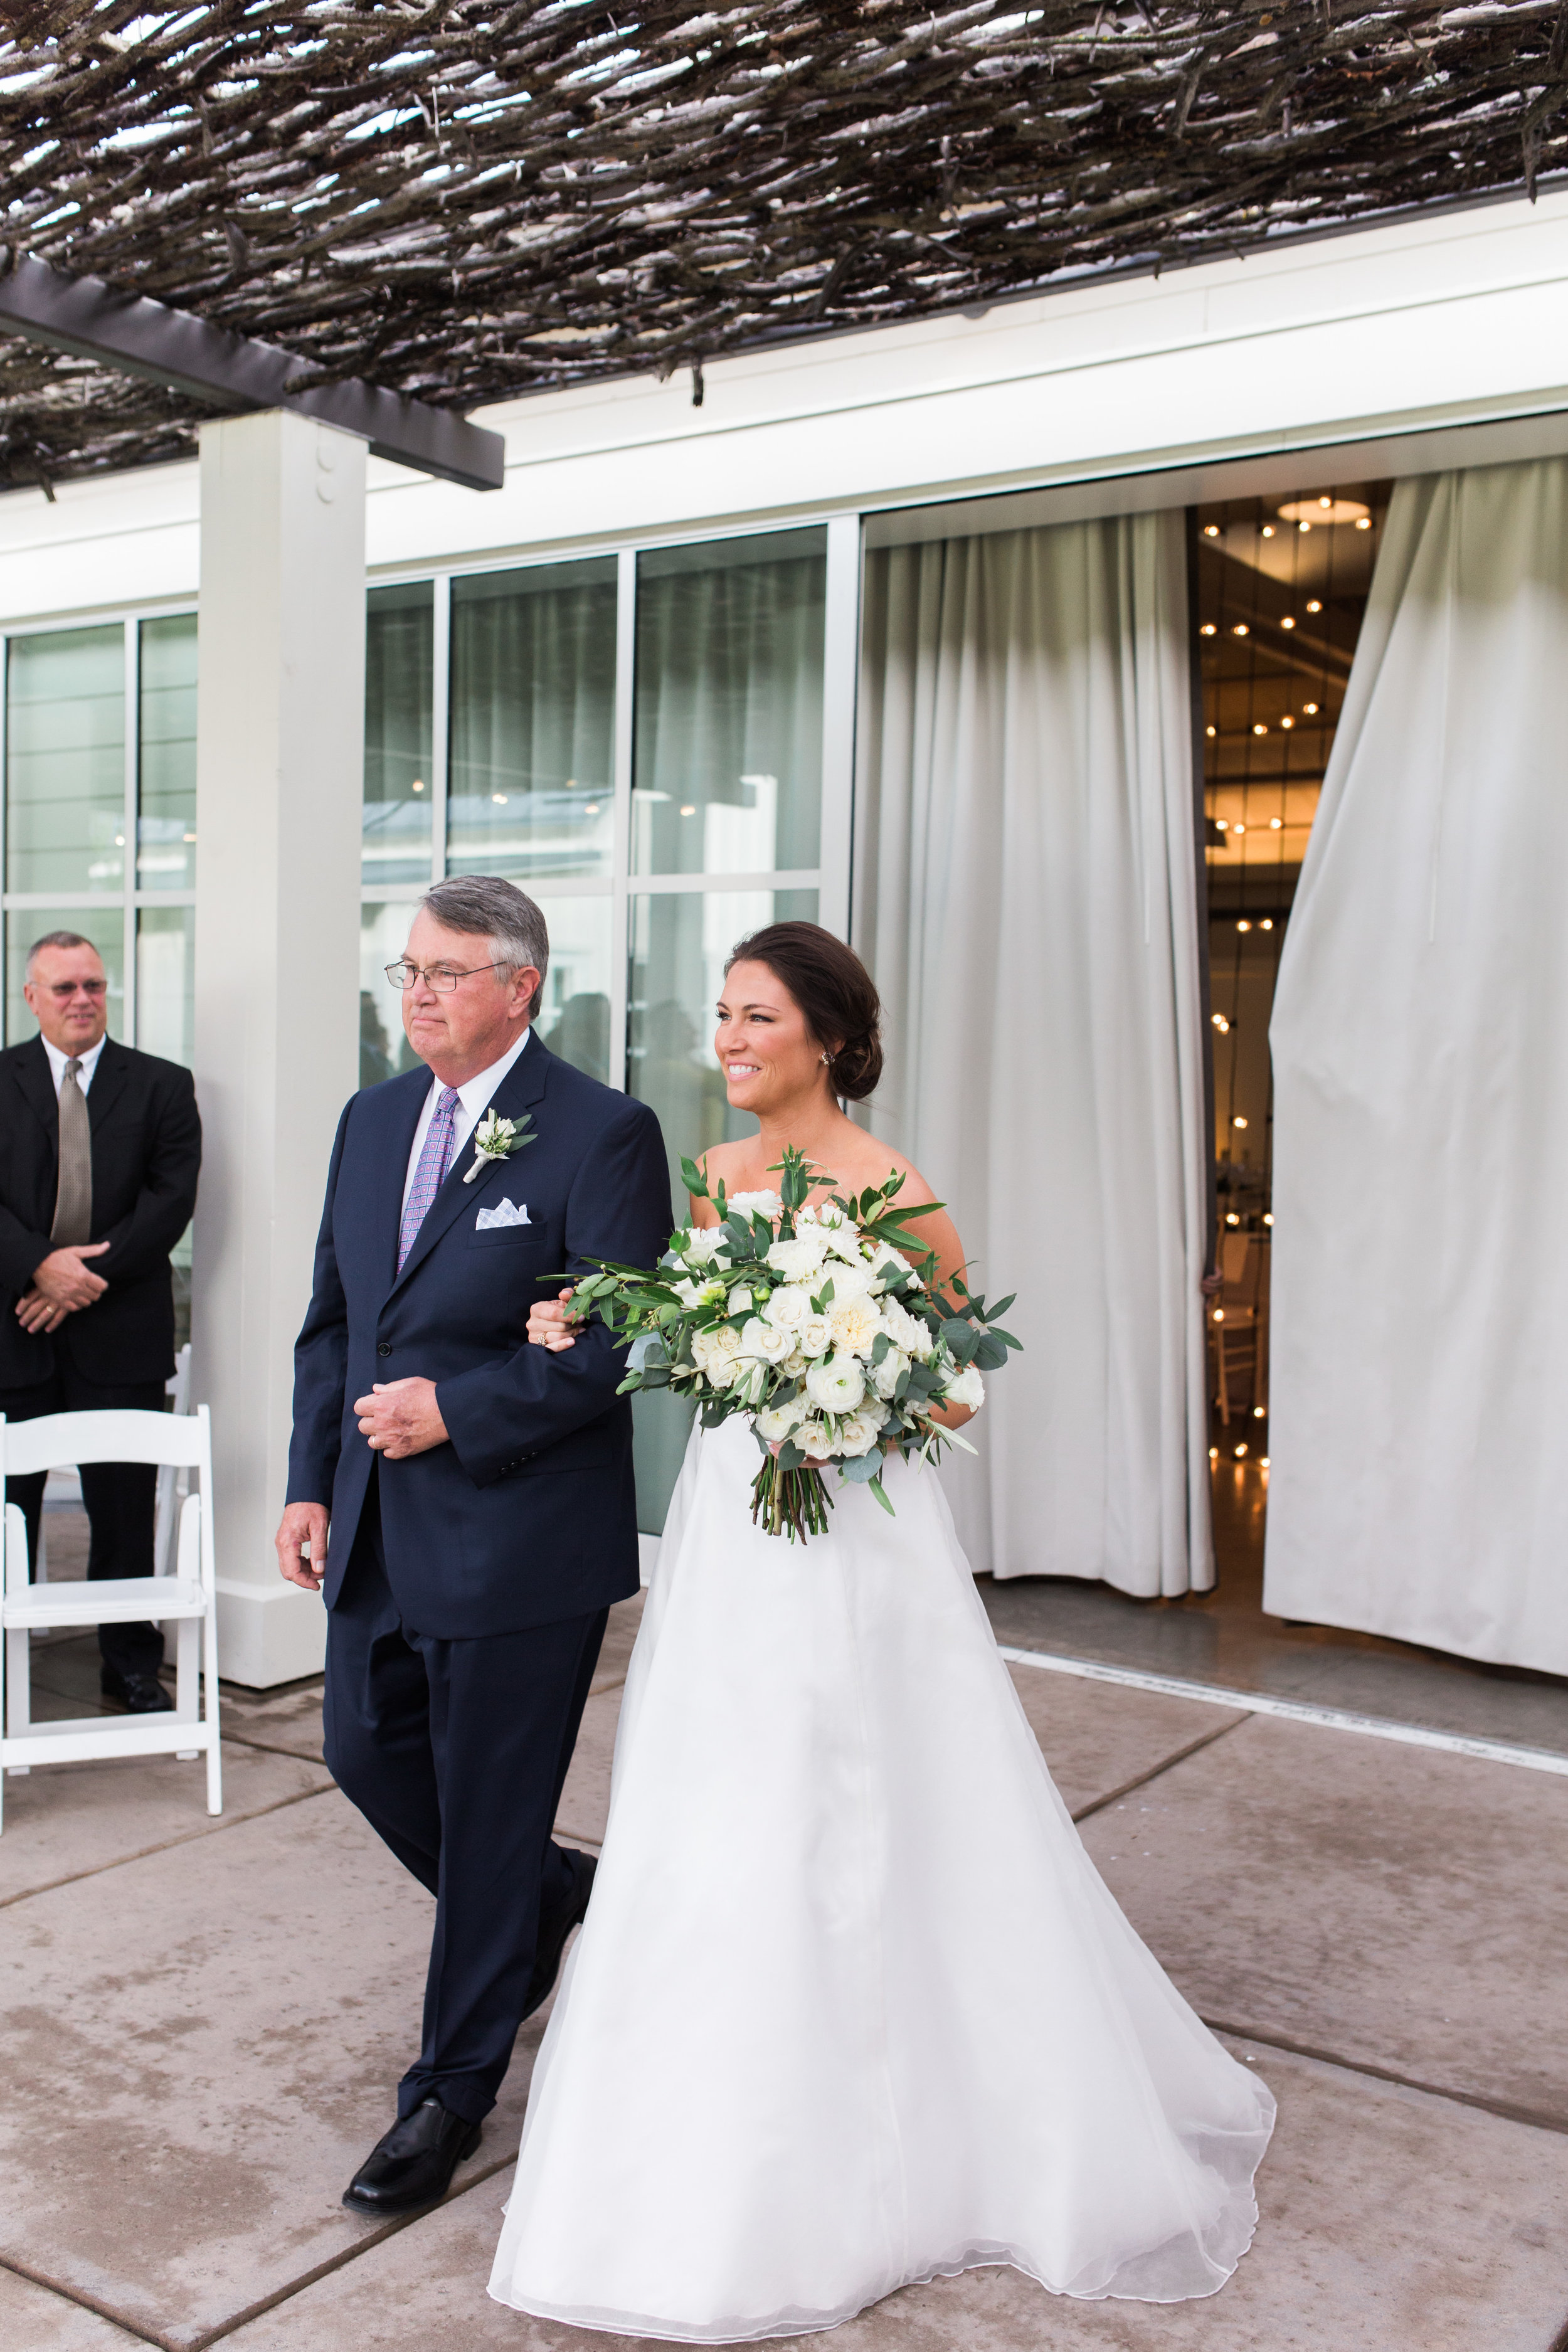 intimate-wedding-at-solage-calistoga-in-napa-57.jpg